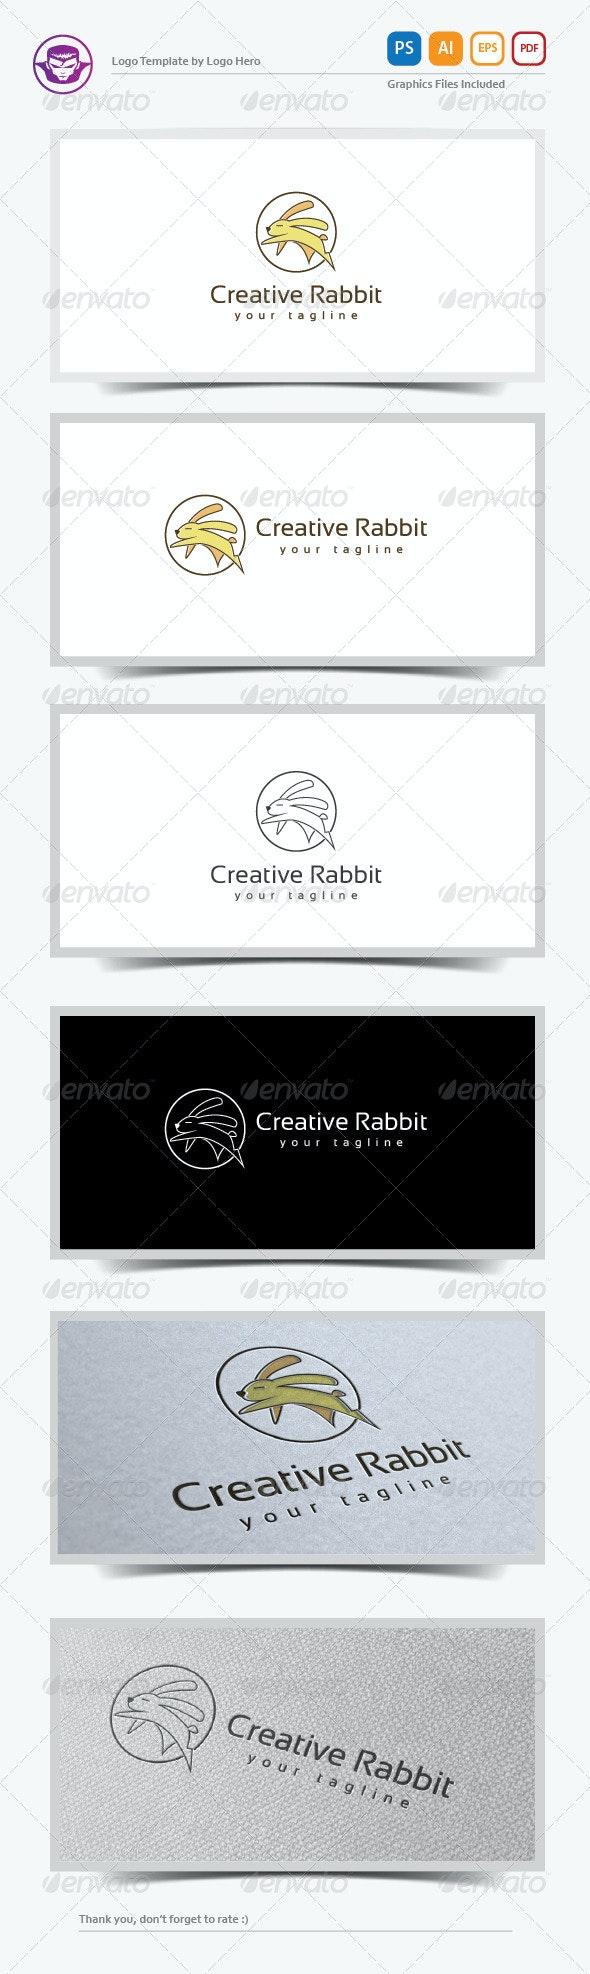 Creative Rabbit Logo Template - Animals Logo Templates